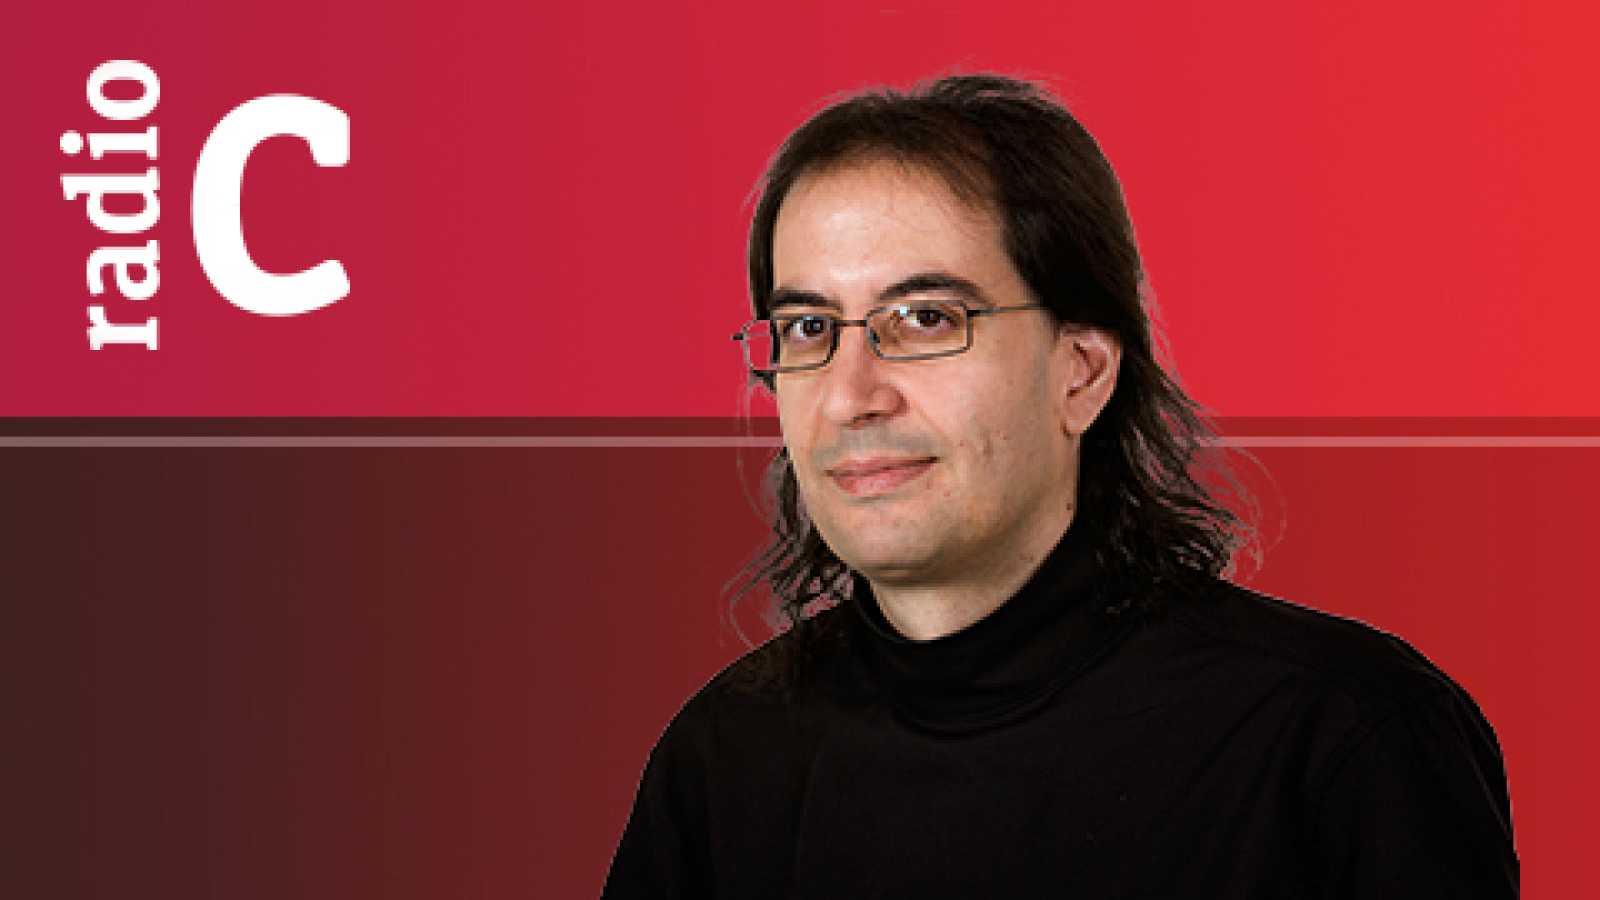 Ars Sonora - Rubén López Cano: Música dispersa (II) - 16/06/18 - escuchar ahora